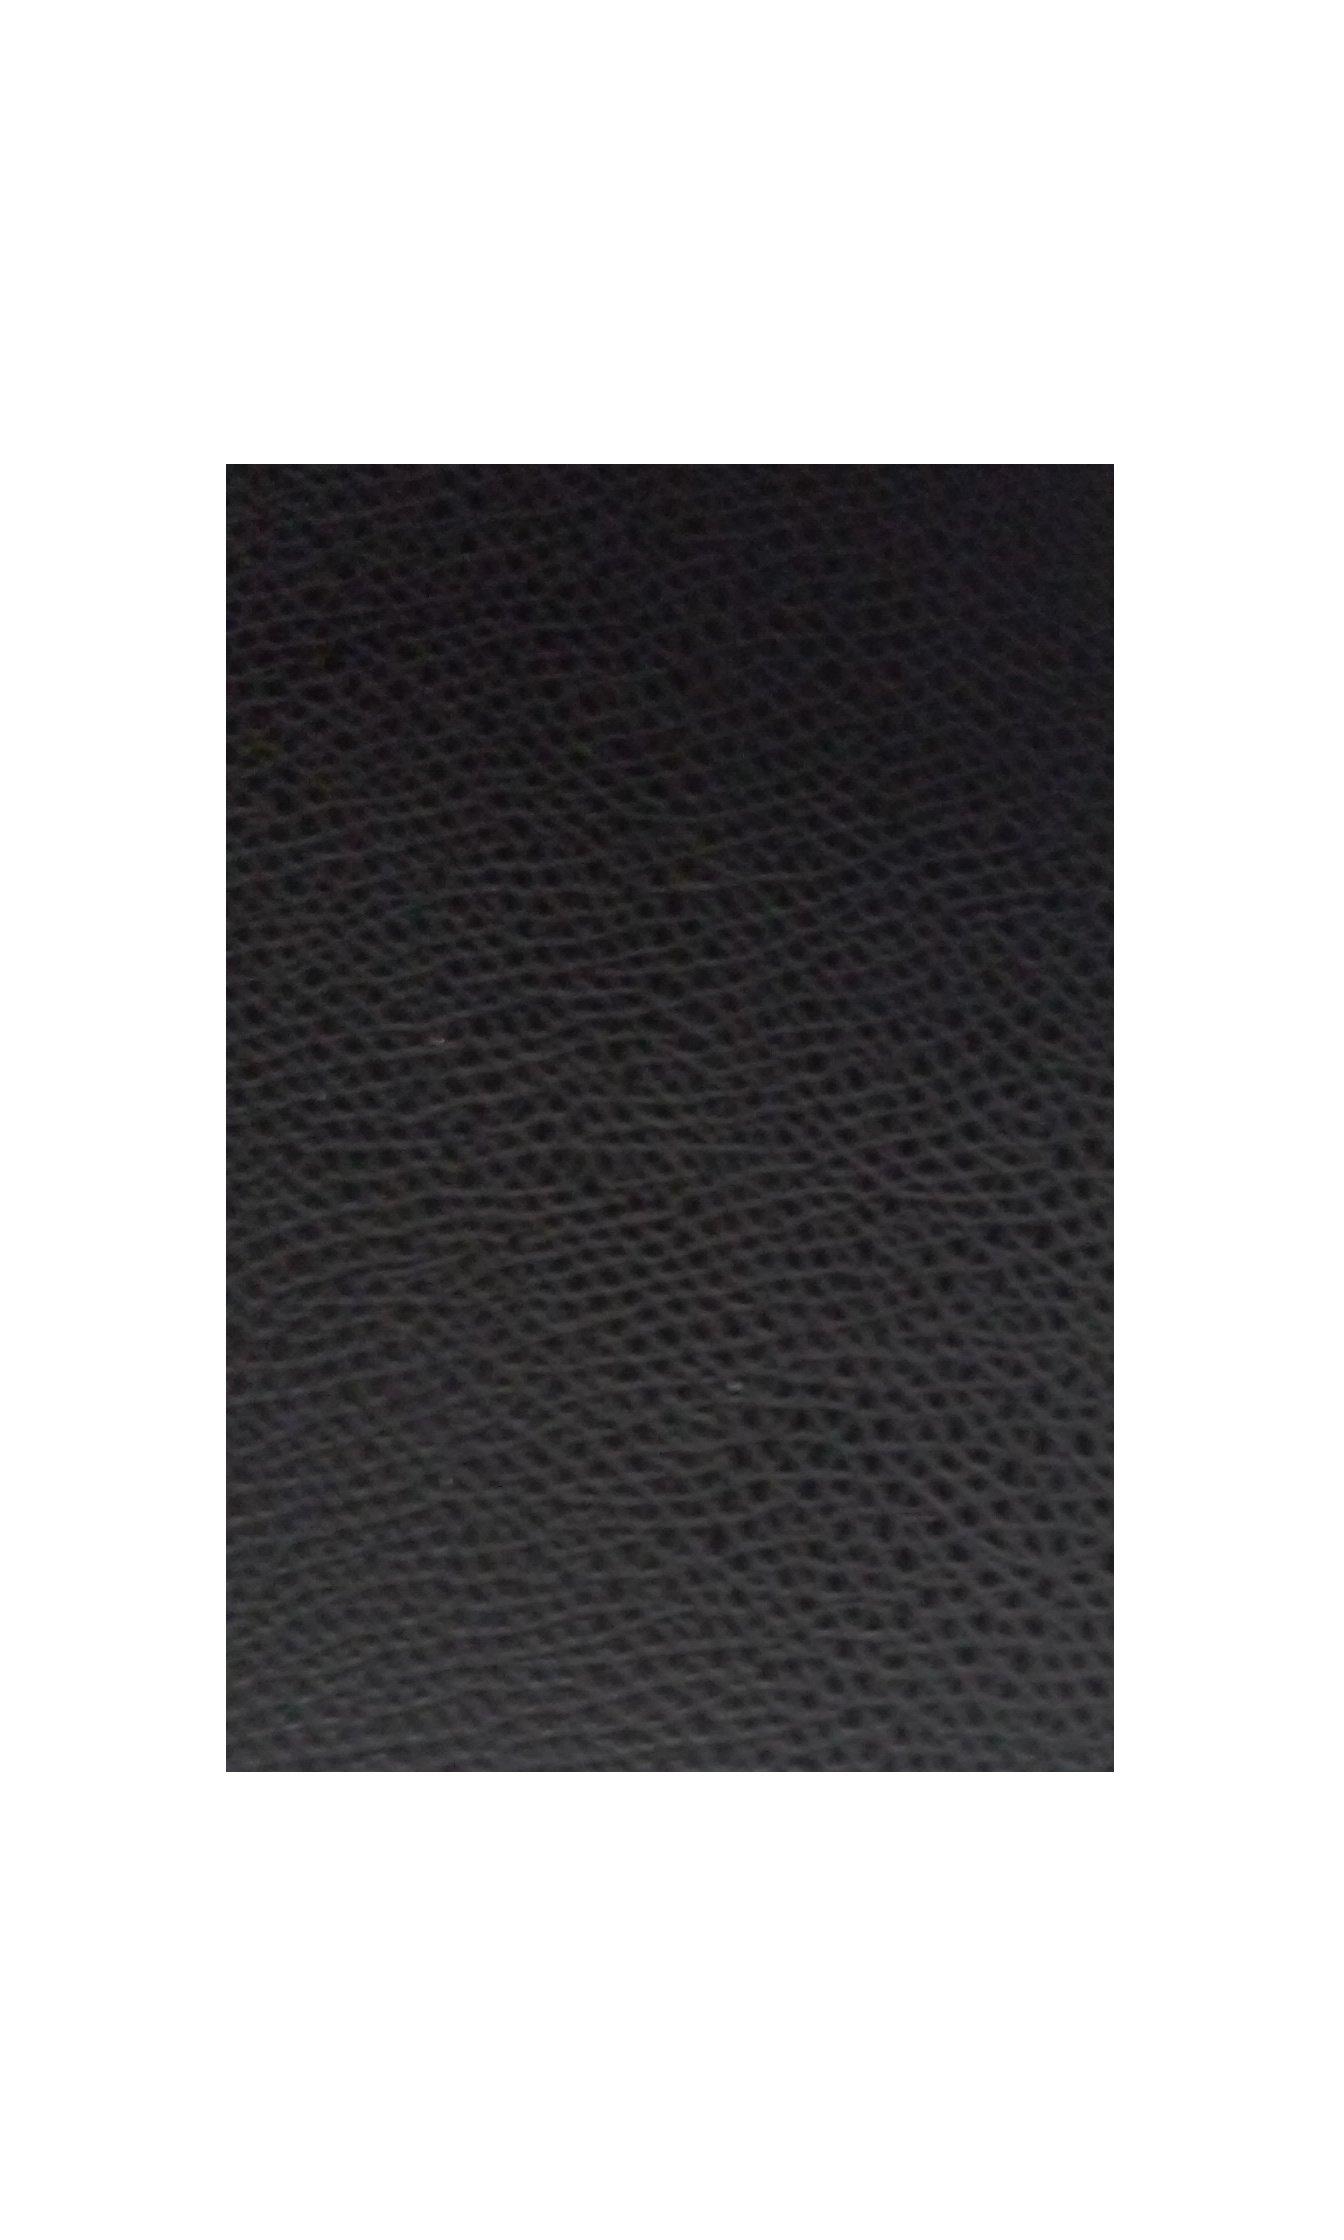 Quo Vadis 2019 Business Weekly Pocket 4'' x 6'' (10 x 15 cm) Club Cover (Black)